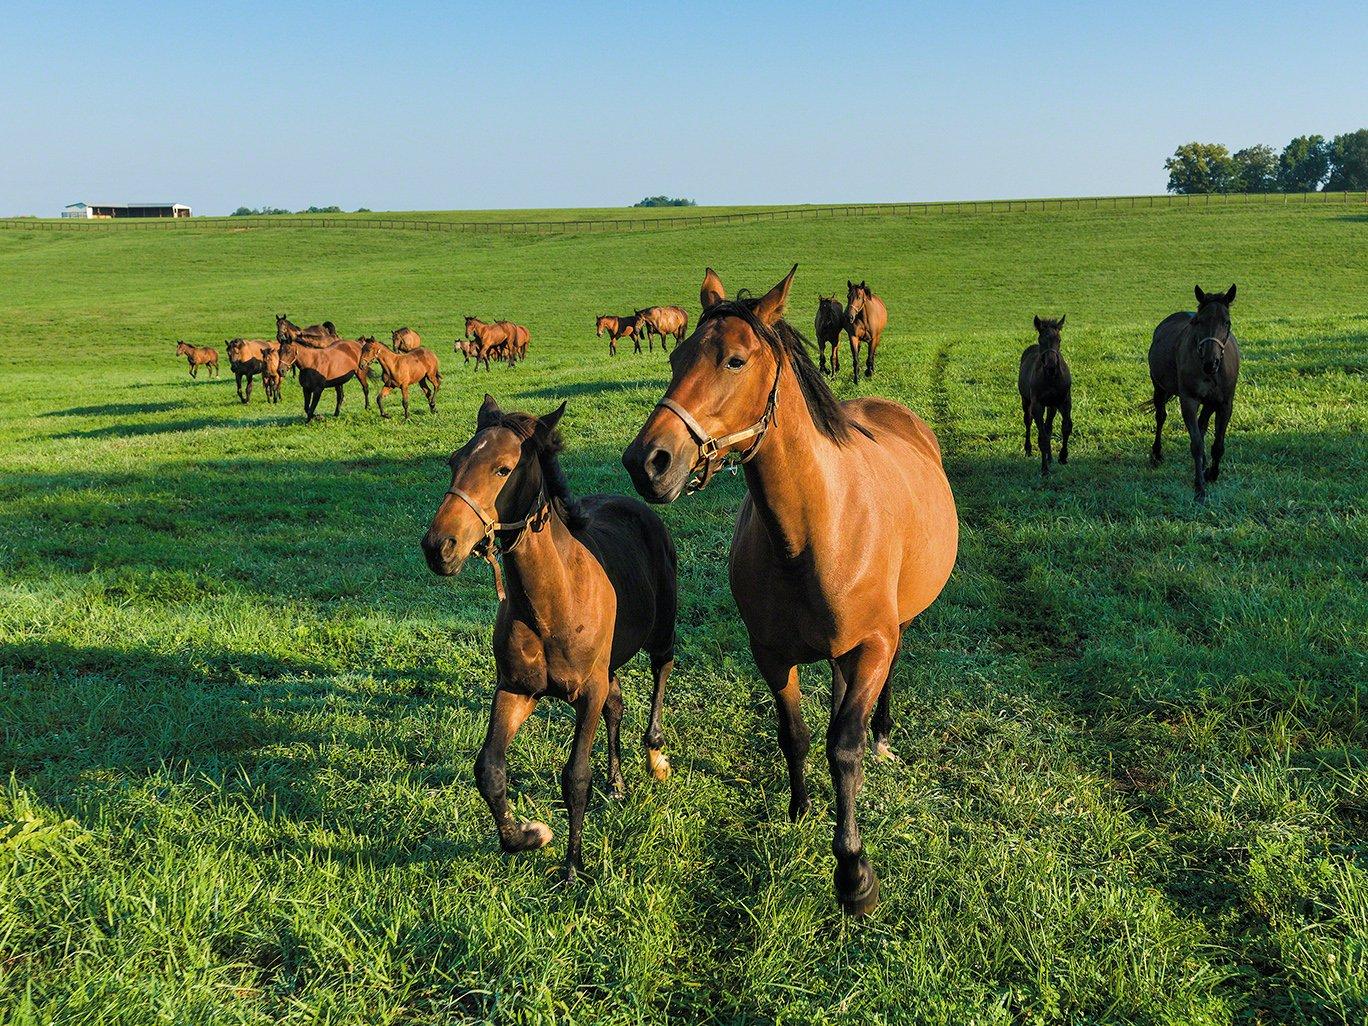 Horse Farm Views at the Horse Capital of the World: Lexington, Kentucky